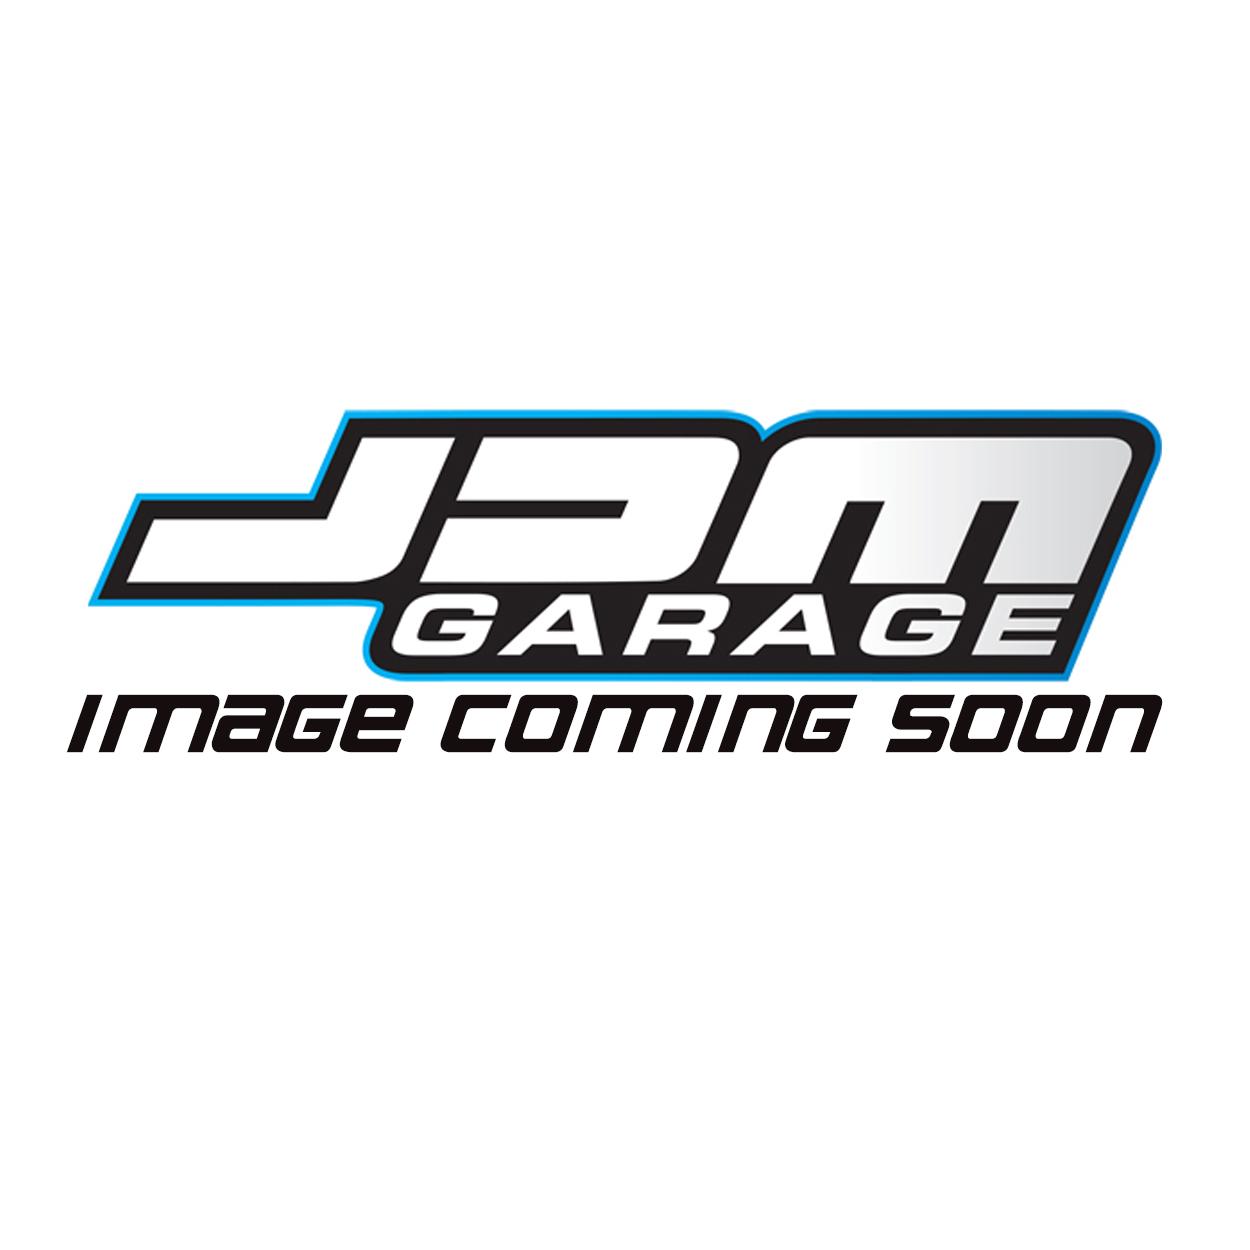 Genuine Nissan OEM RB25DET Gearbox Speed Speedo Sensor With Pinon Gear Fits Nissan Skyline R33 GTST / R34 GTT 25010-21U00 32743-30P20